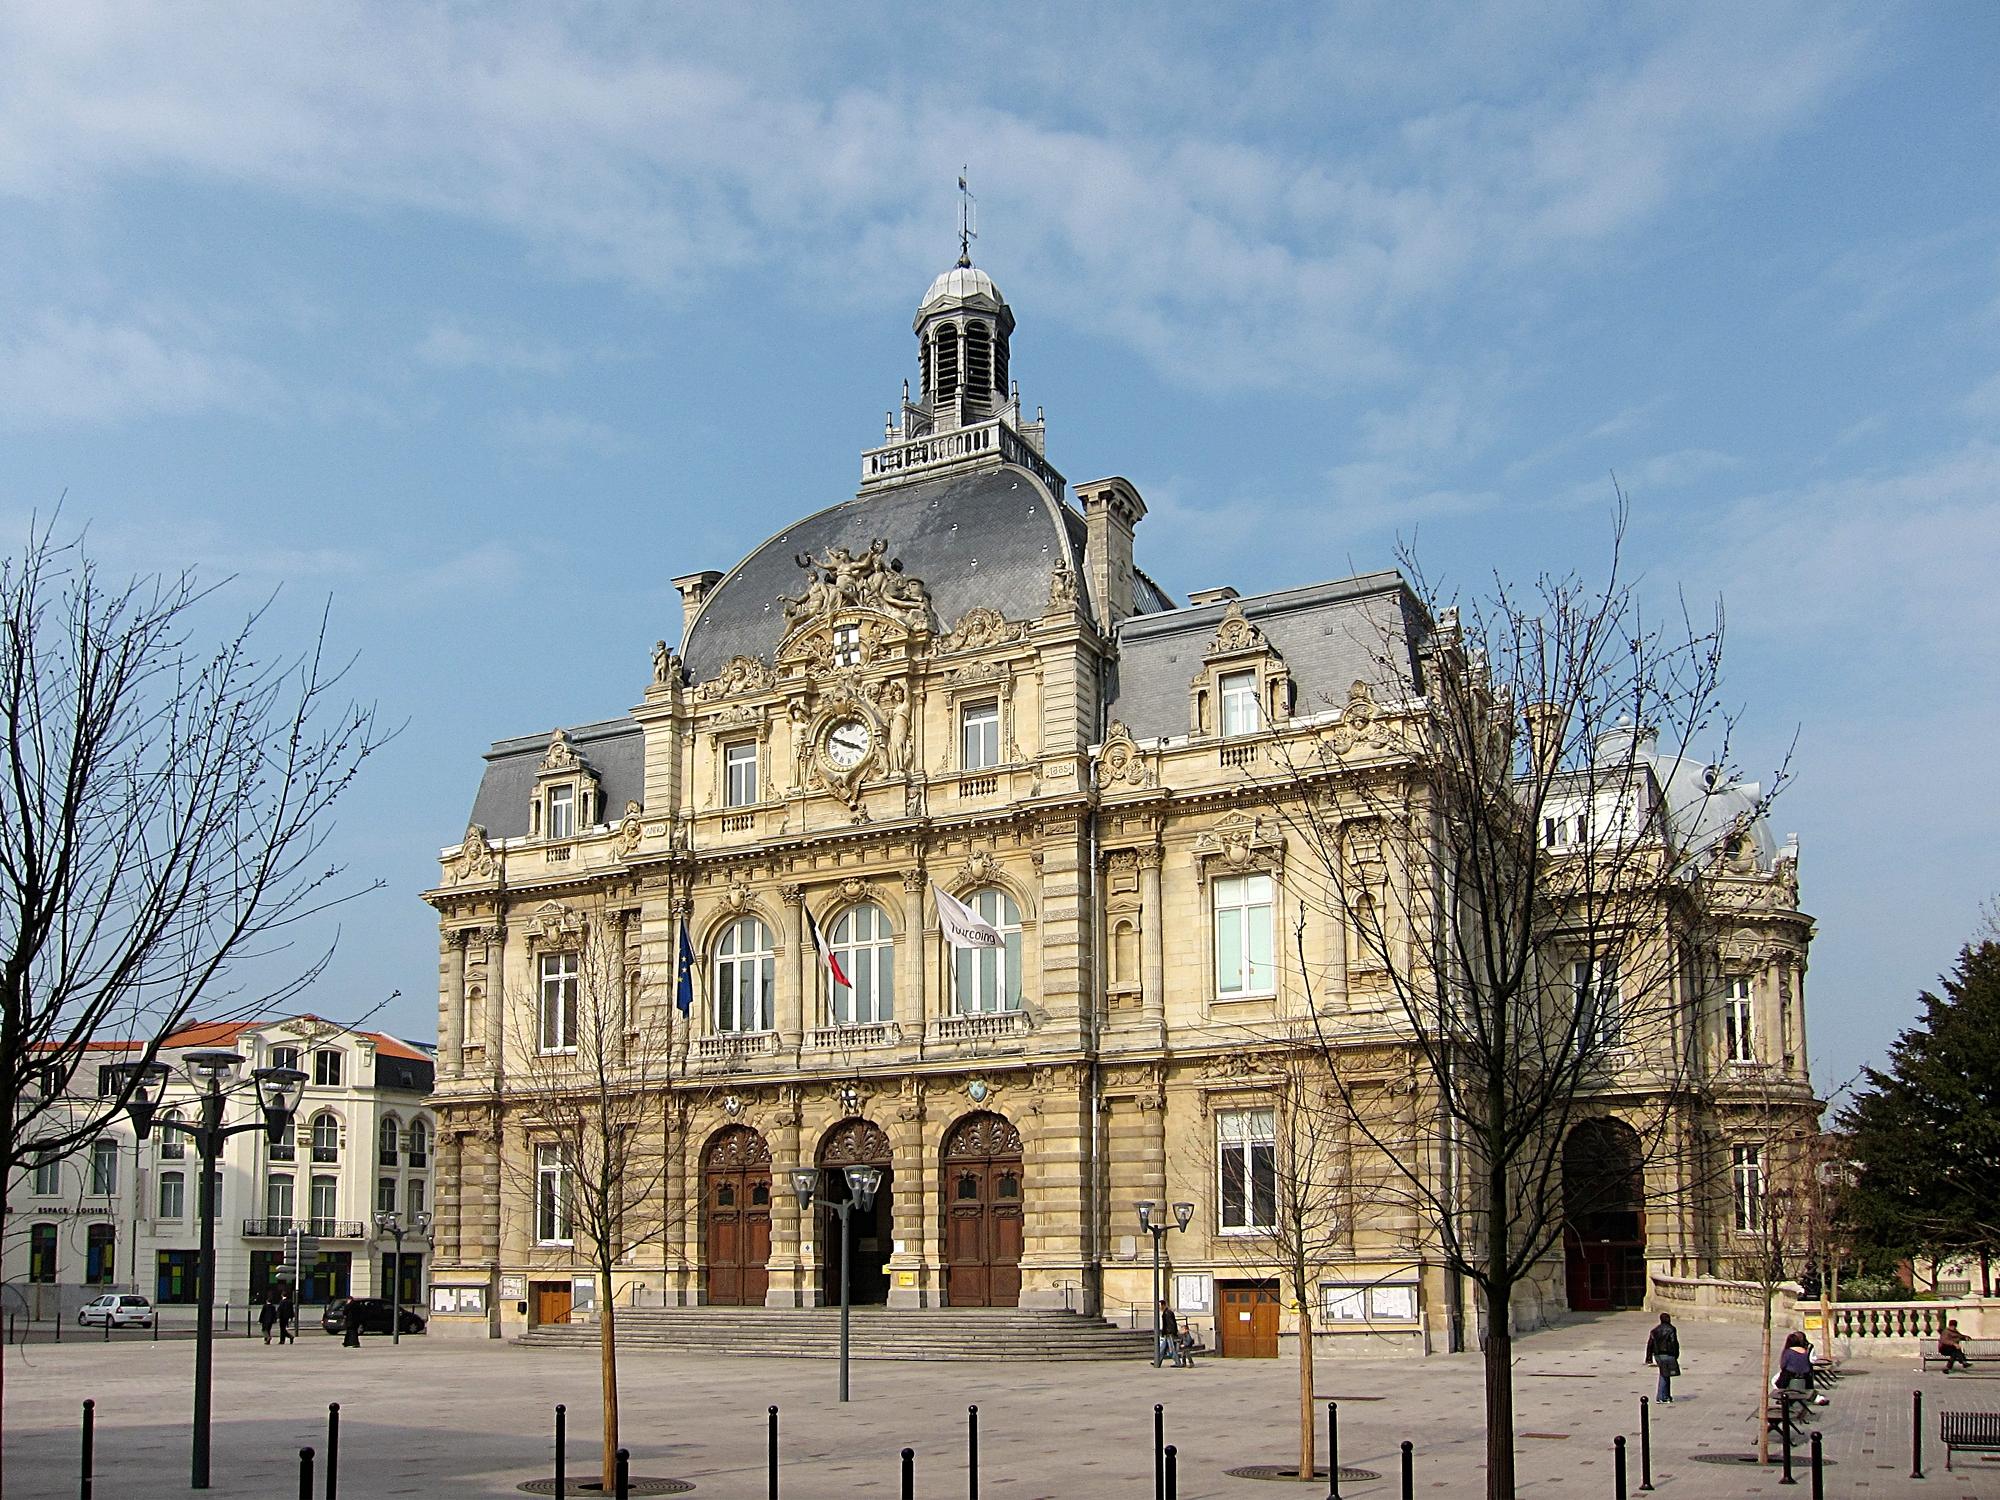 Tourcoing_hotel_ville_3-4.JPG